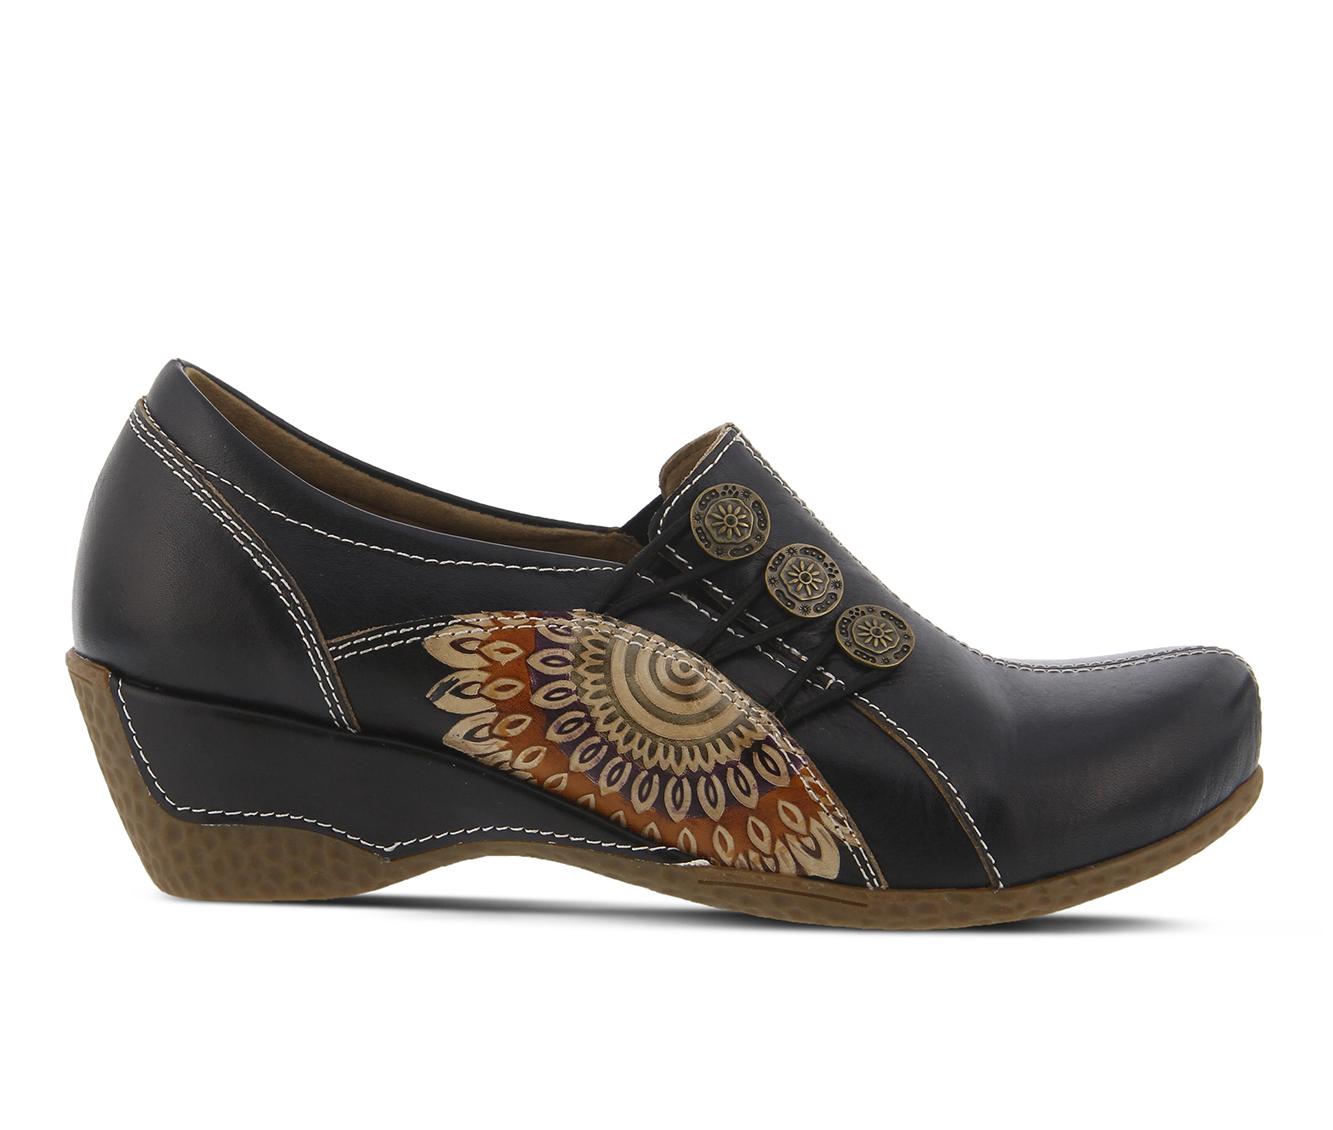 L'Artiste Agacia Women's Shoe (Black Leather)